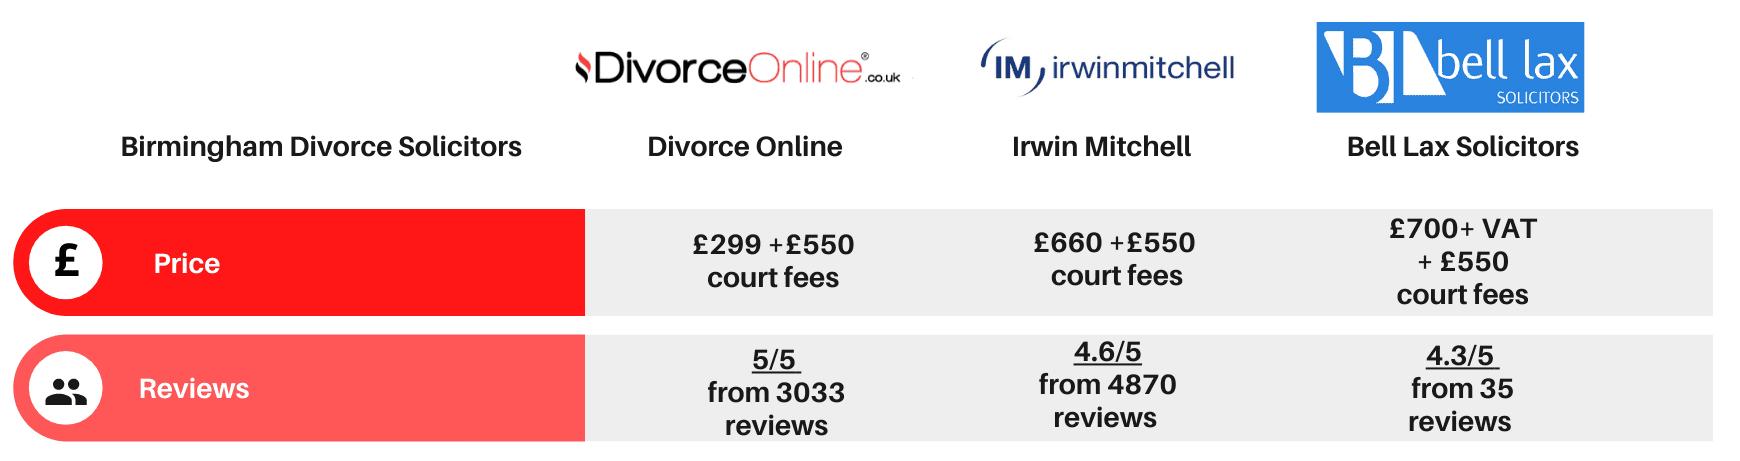 birmingham divorce solicitors table